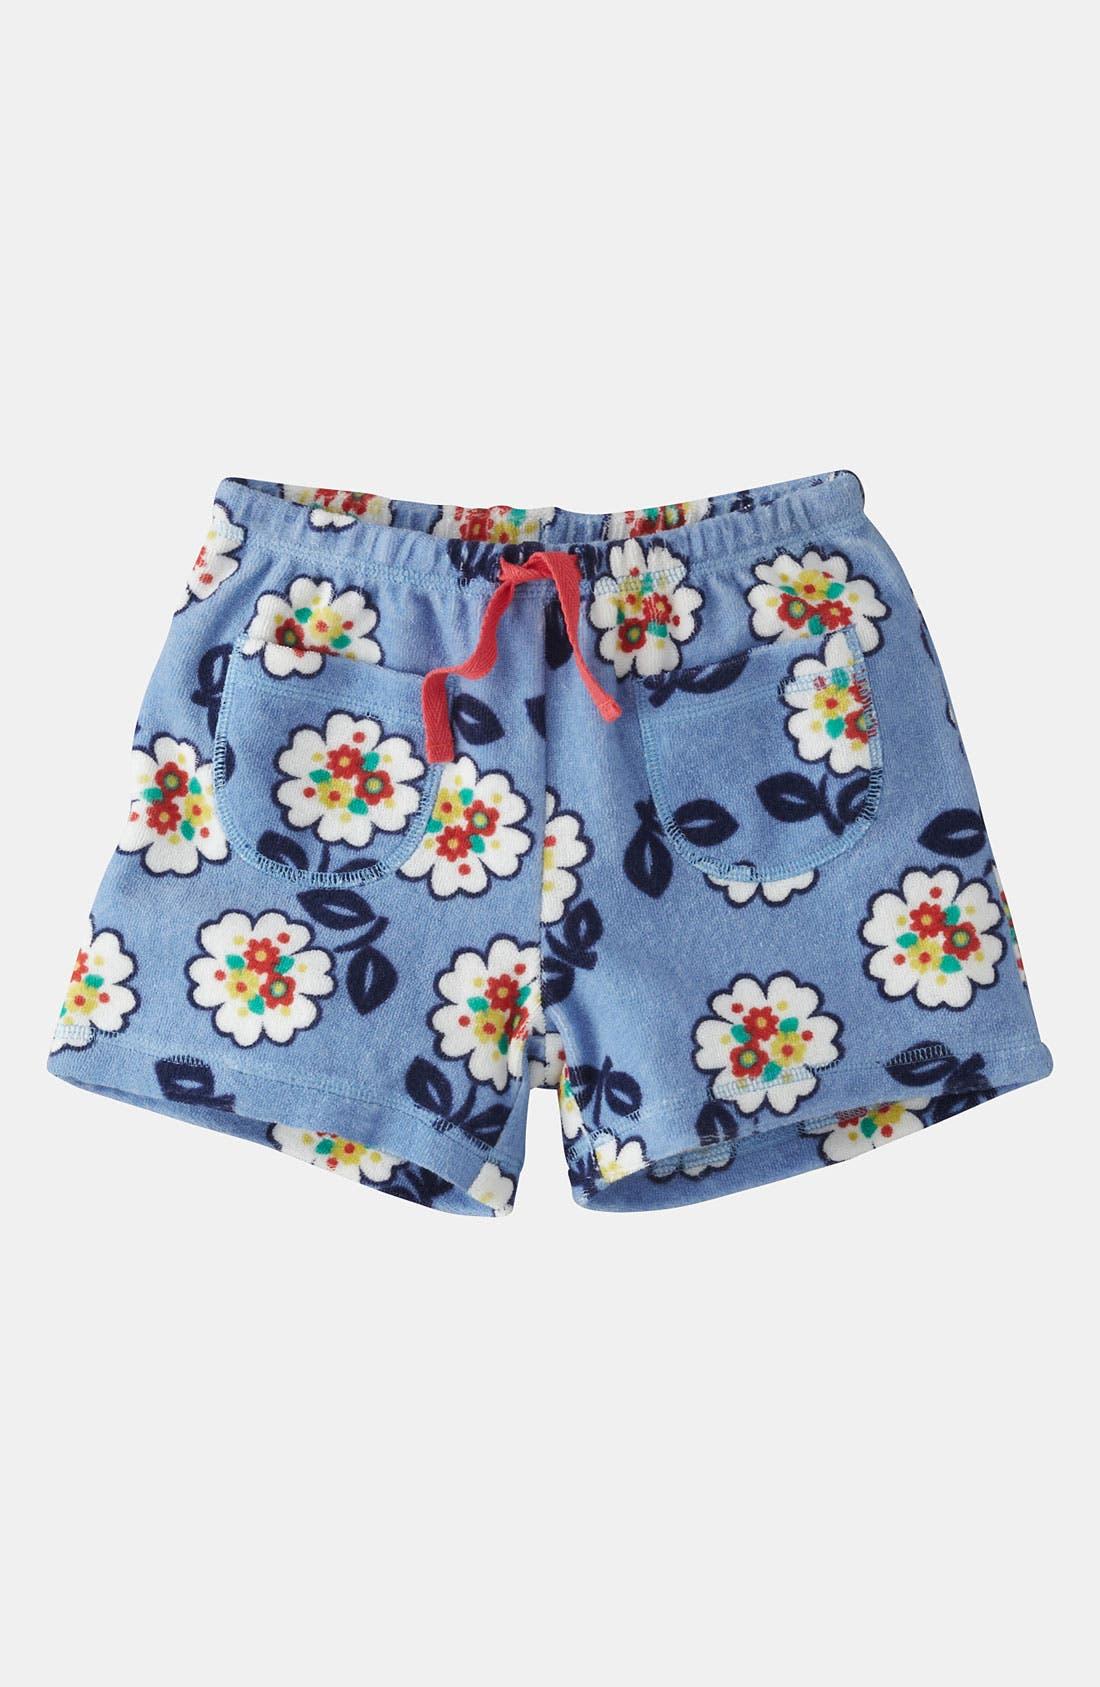 Alternate Image 1 Selected - Mini Boden 'Toweling' Shorts (Little Girls & Big Girls)